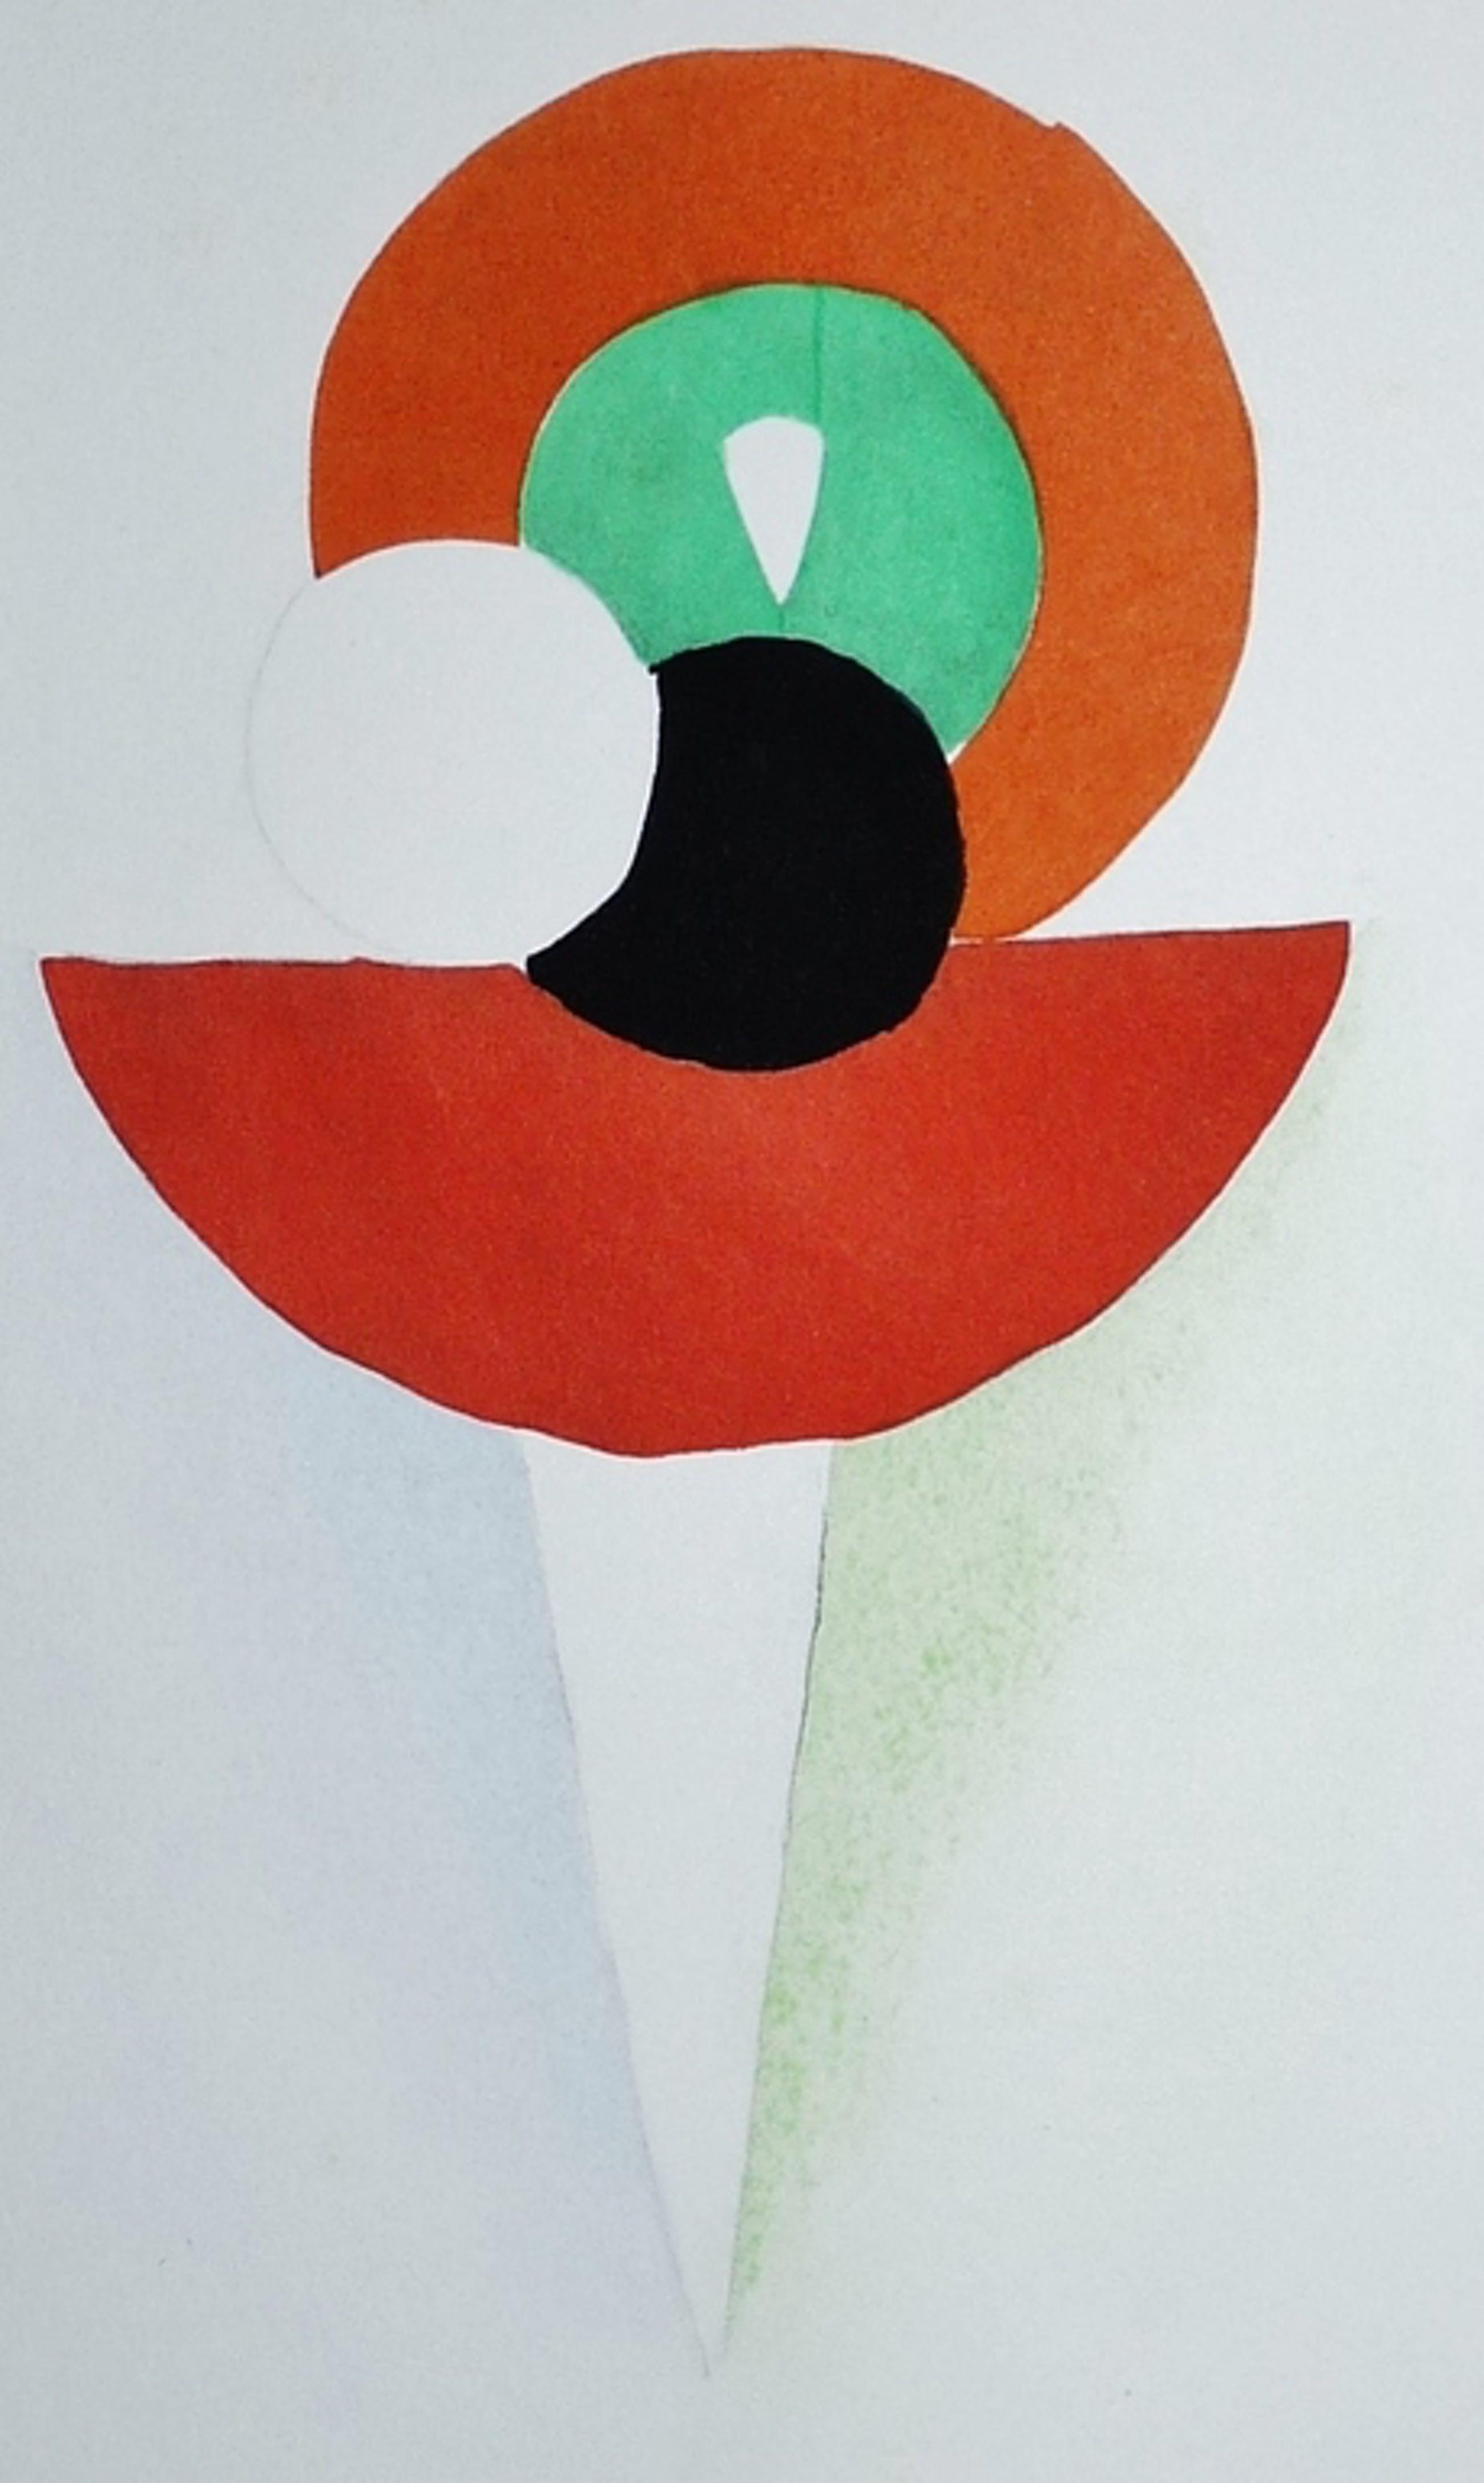 Sonia Delaunay, Pochoir uit Tableaux Vivants kopen? Bied vanaf 75!